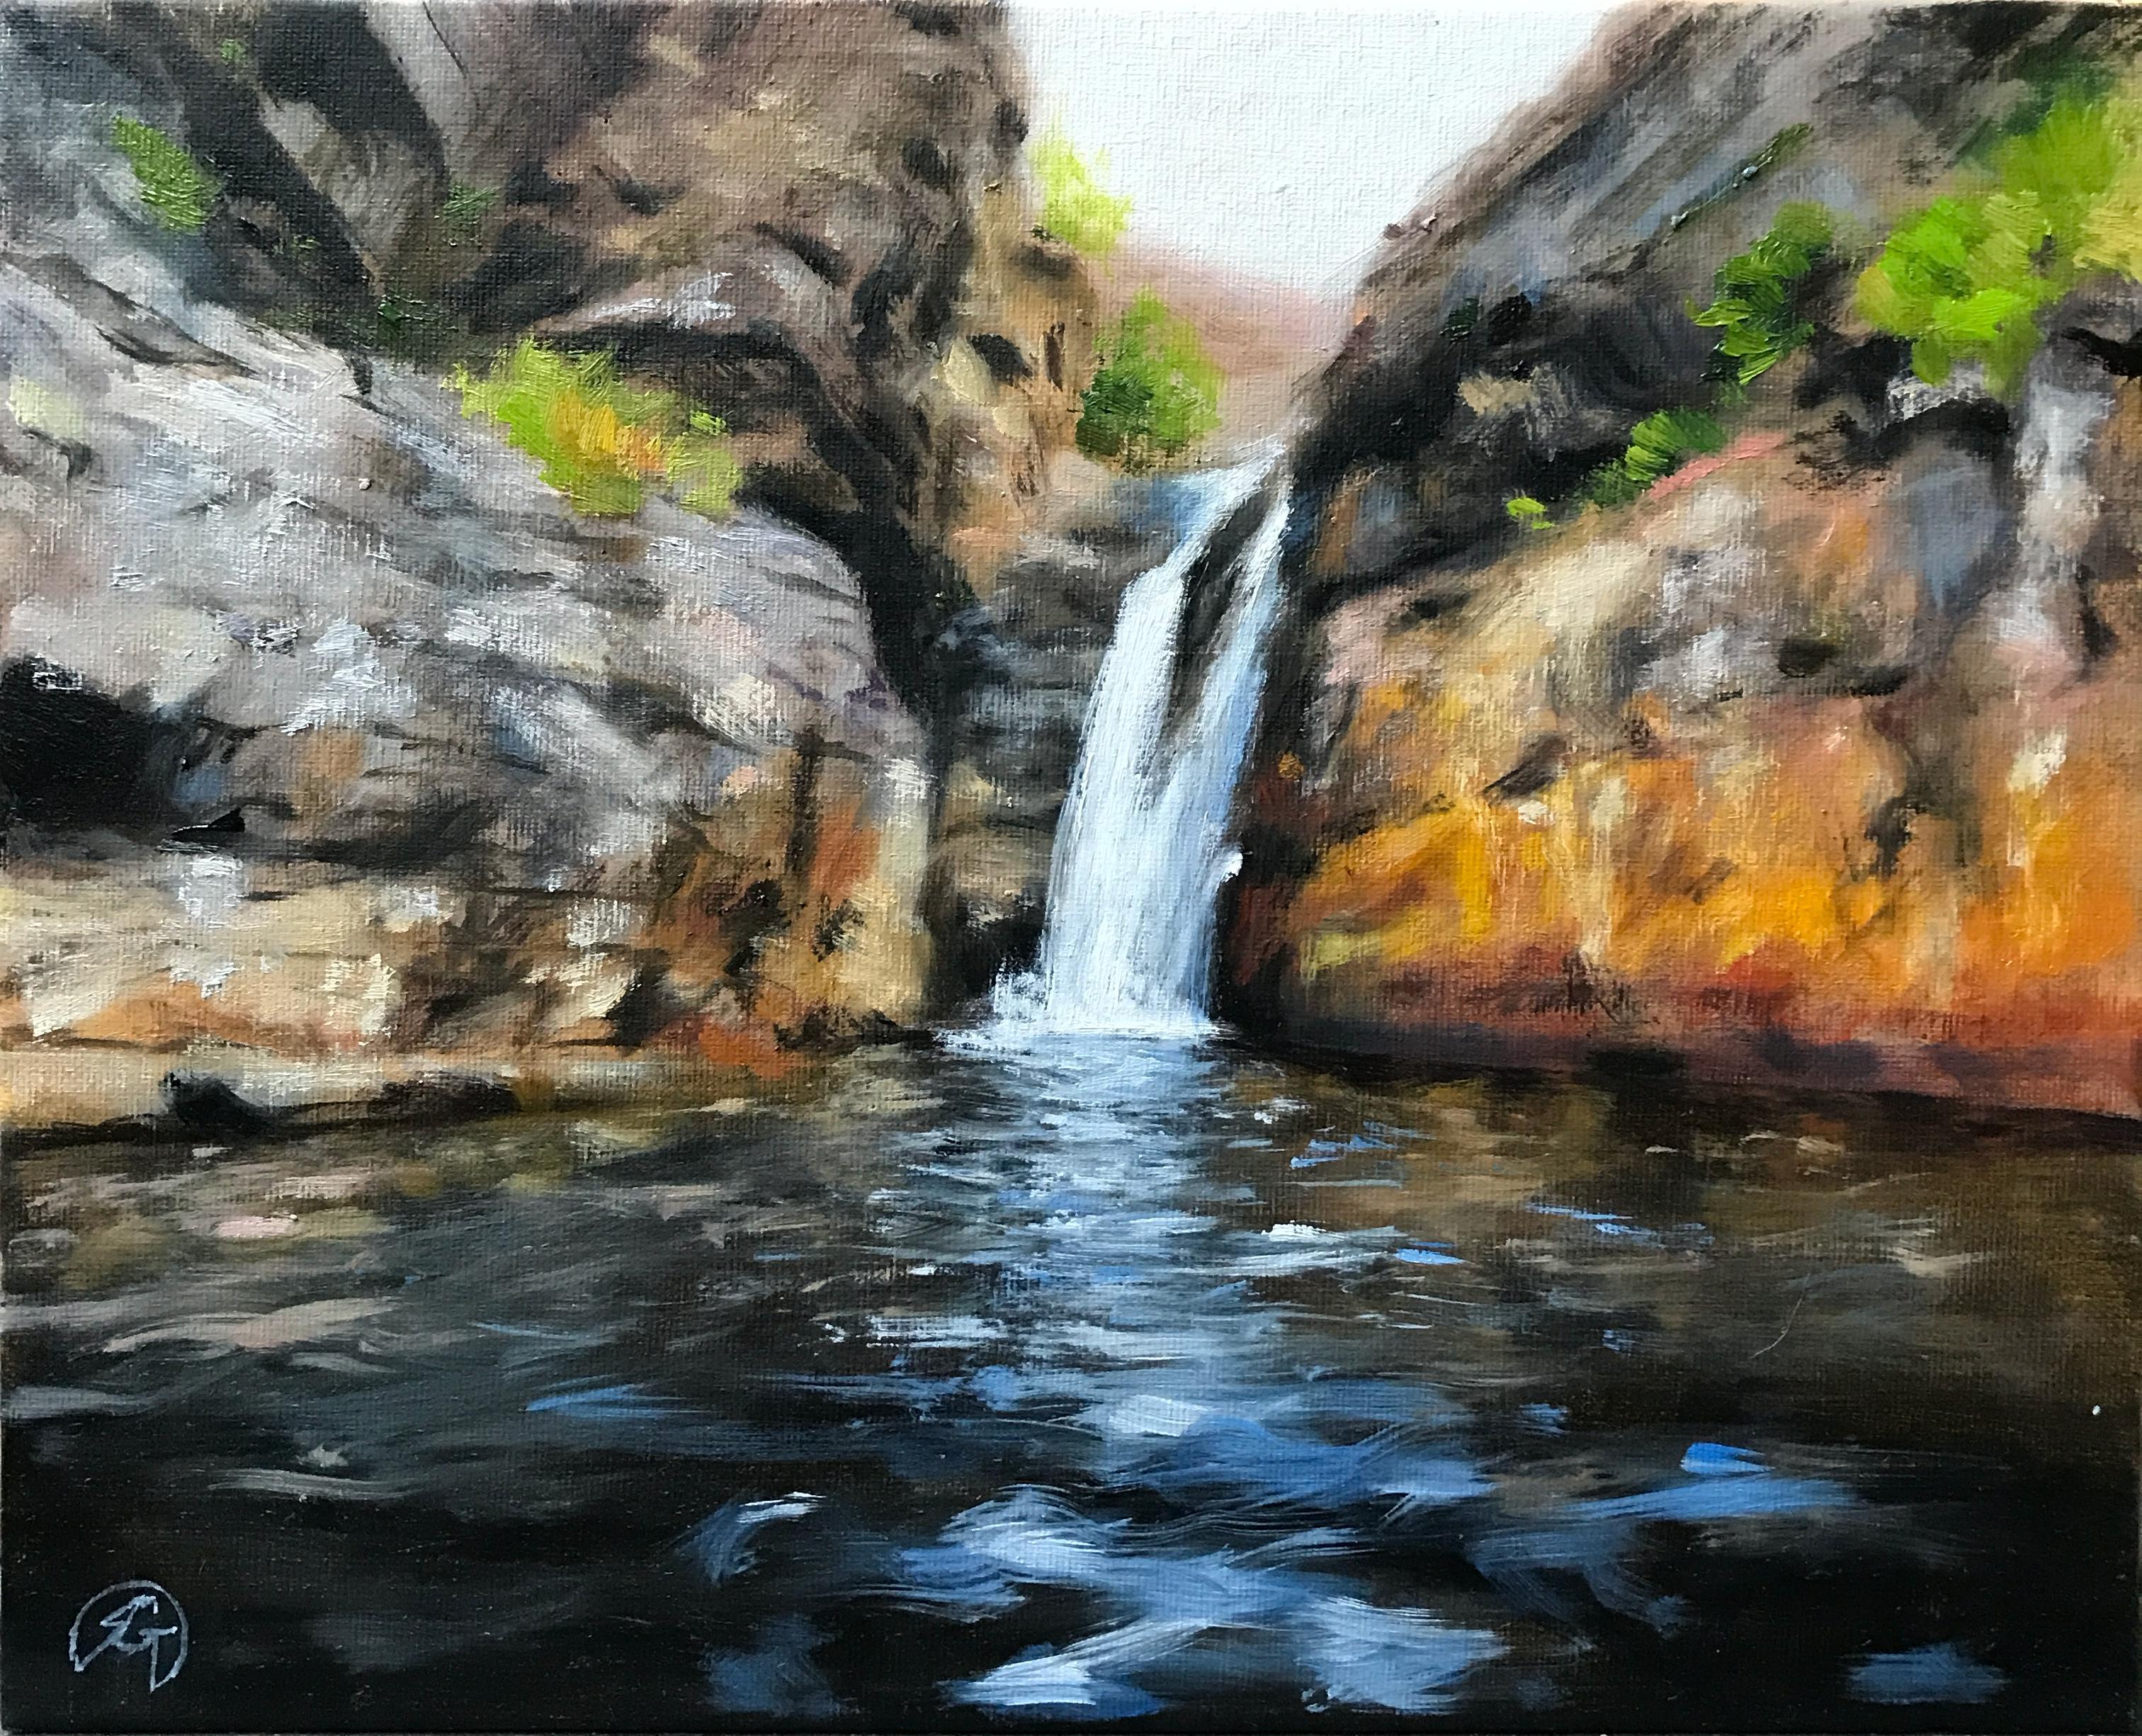 Paisagem Brasileira com Cachoeira, Rafael Guerra Pintura